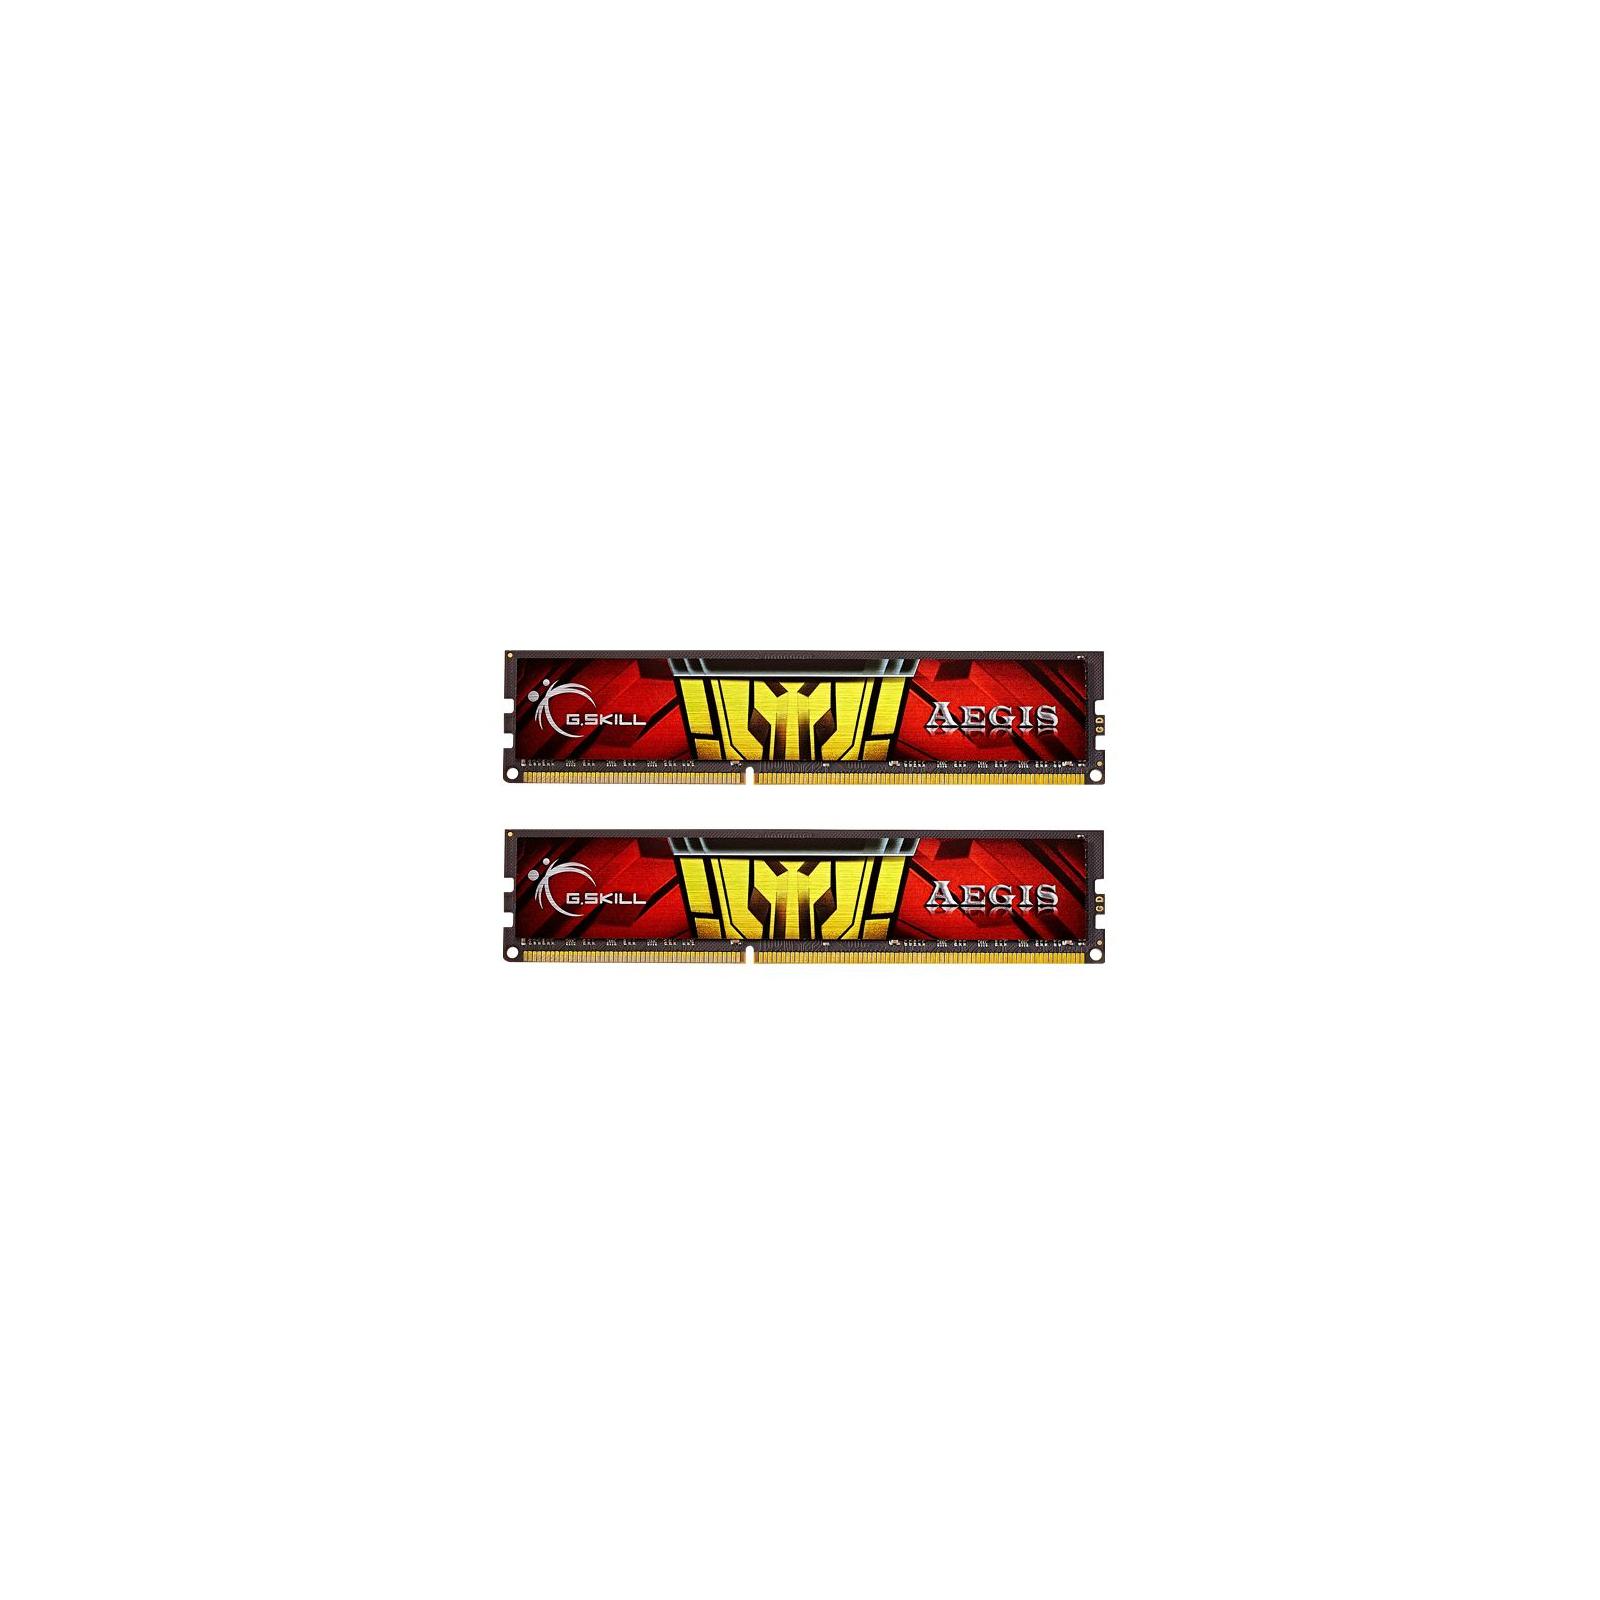 Модуль памяти для компьютера DDR3 8GB (2x4GB) 1333 MHz G.Skill (F3-1333C9D-8GISL)